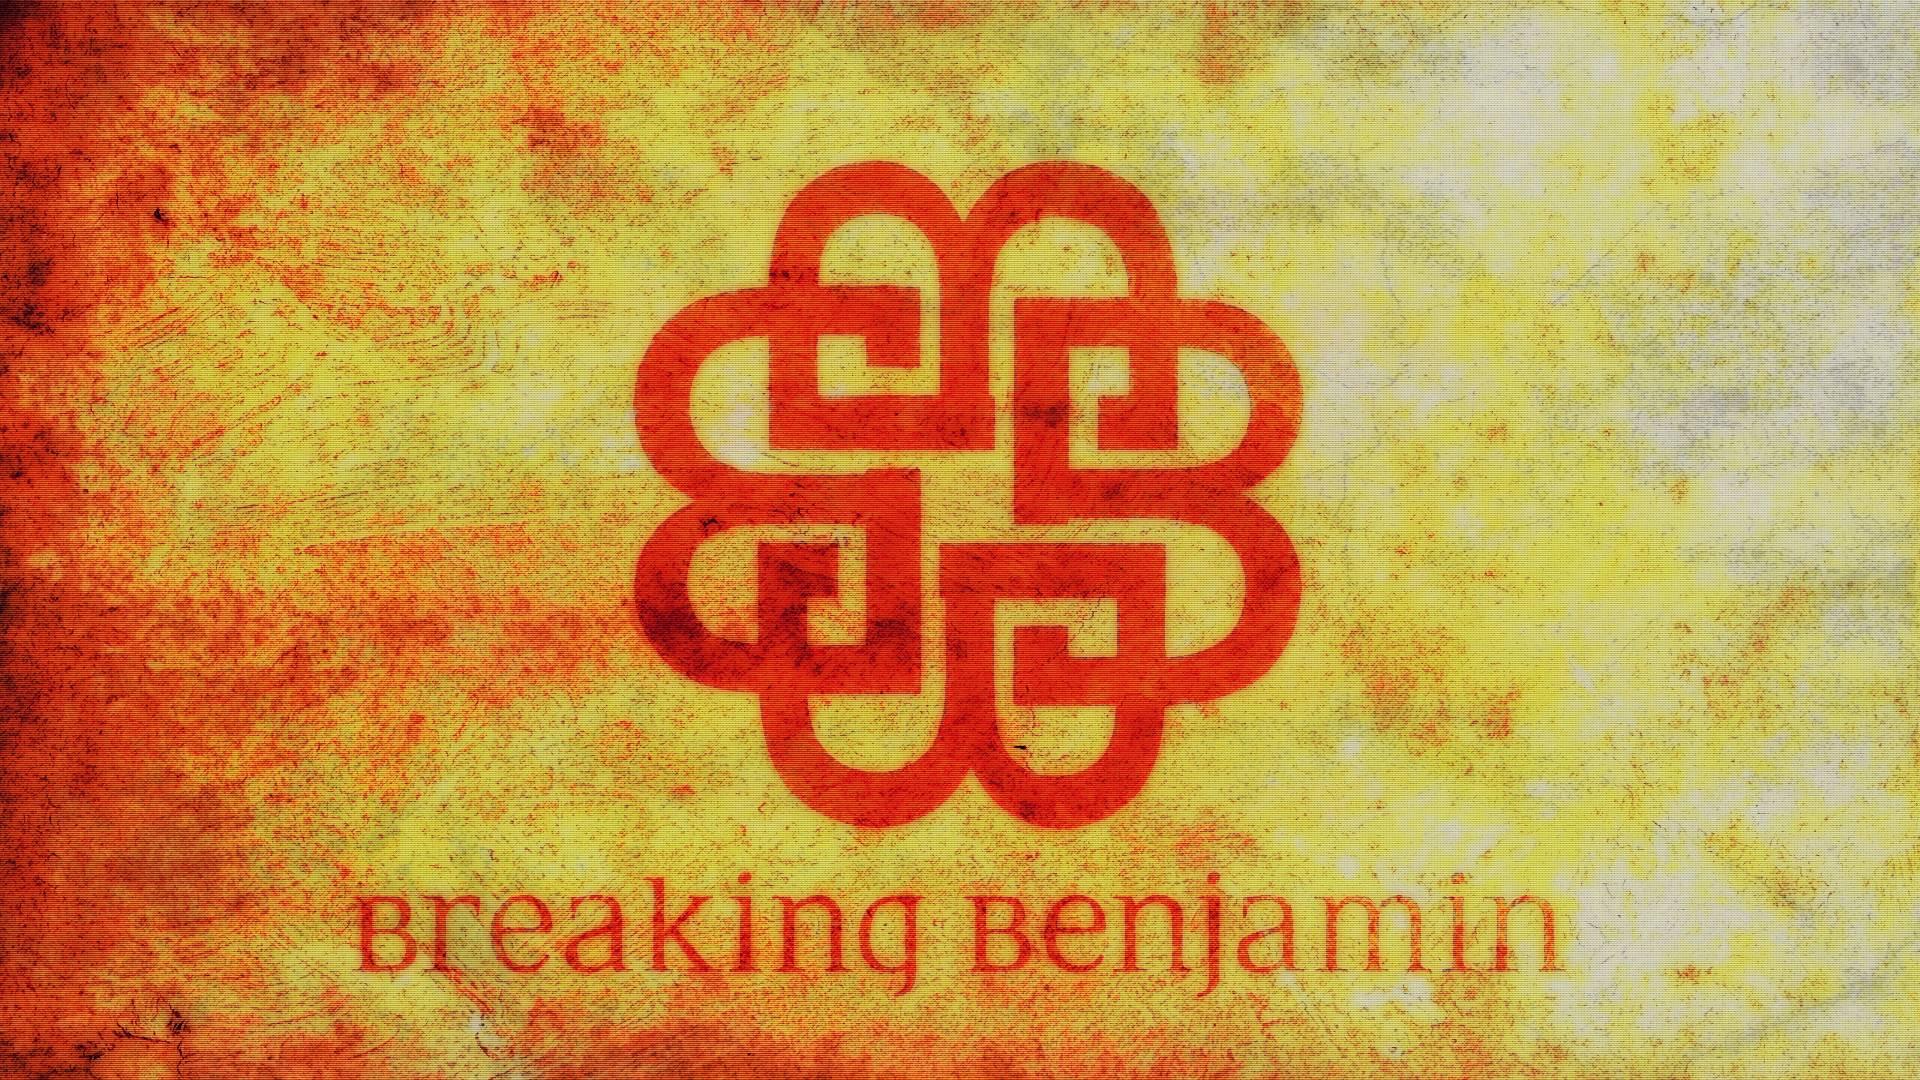 breaking benjamin wallpaper iphone 5